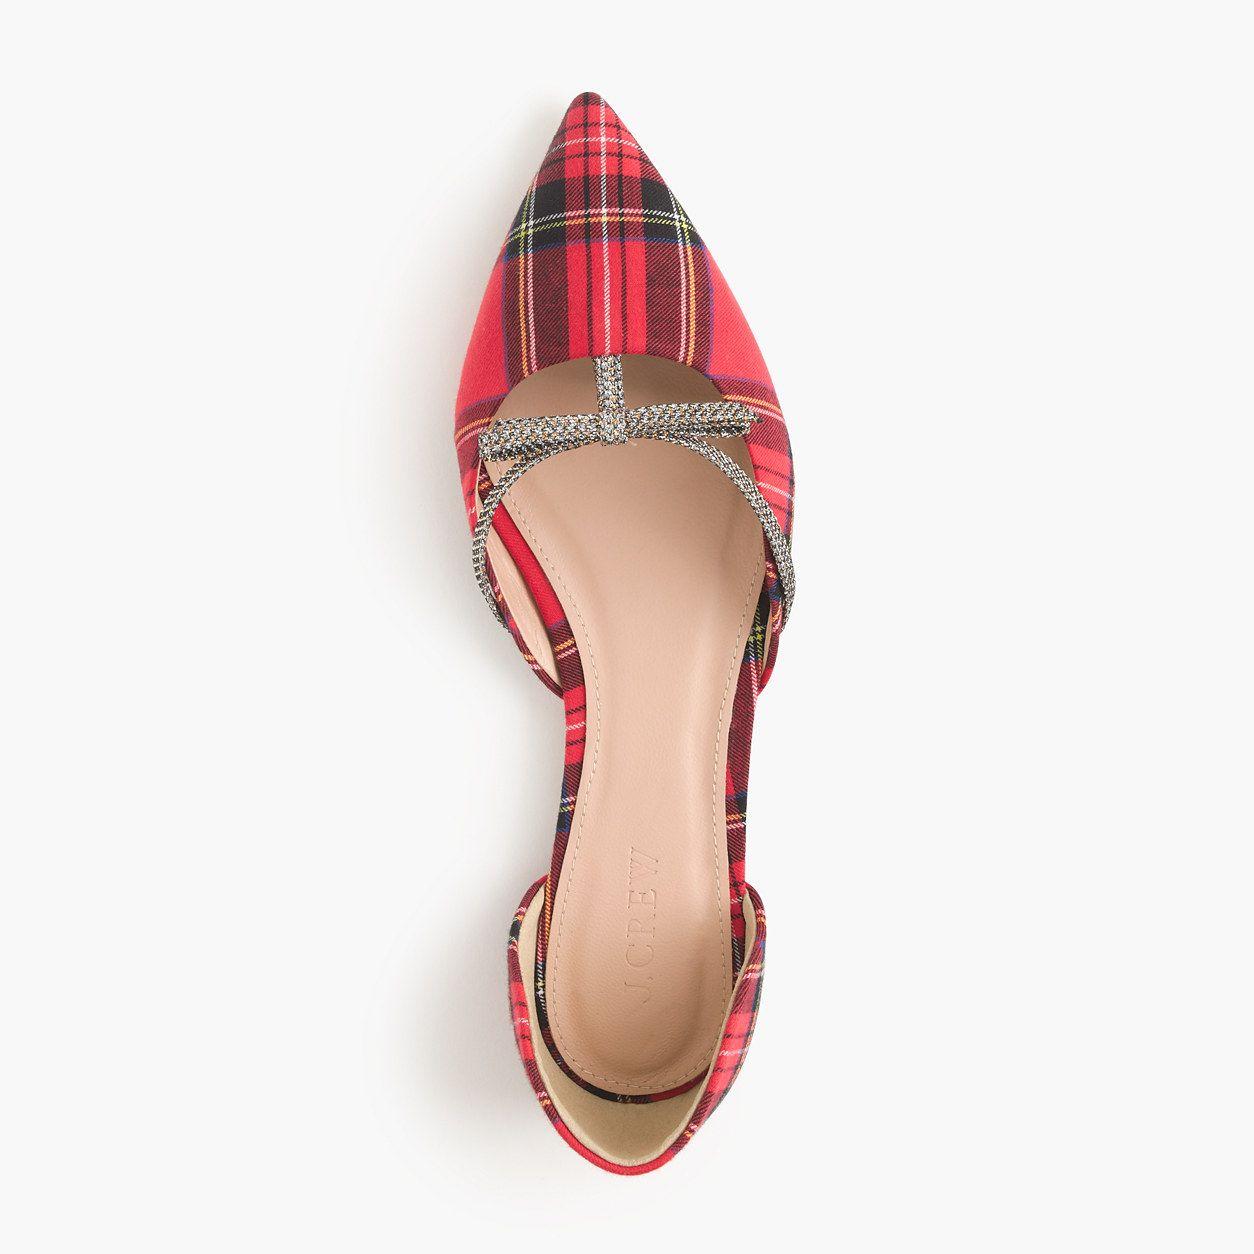 J.Crew   Suede bow, Plaid shoes, Womens